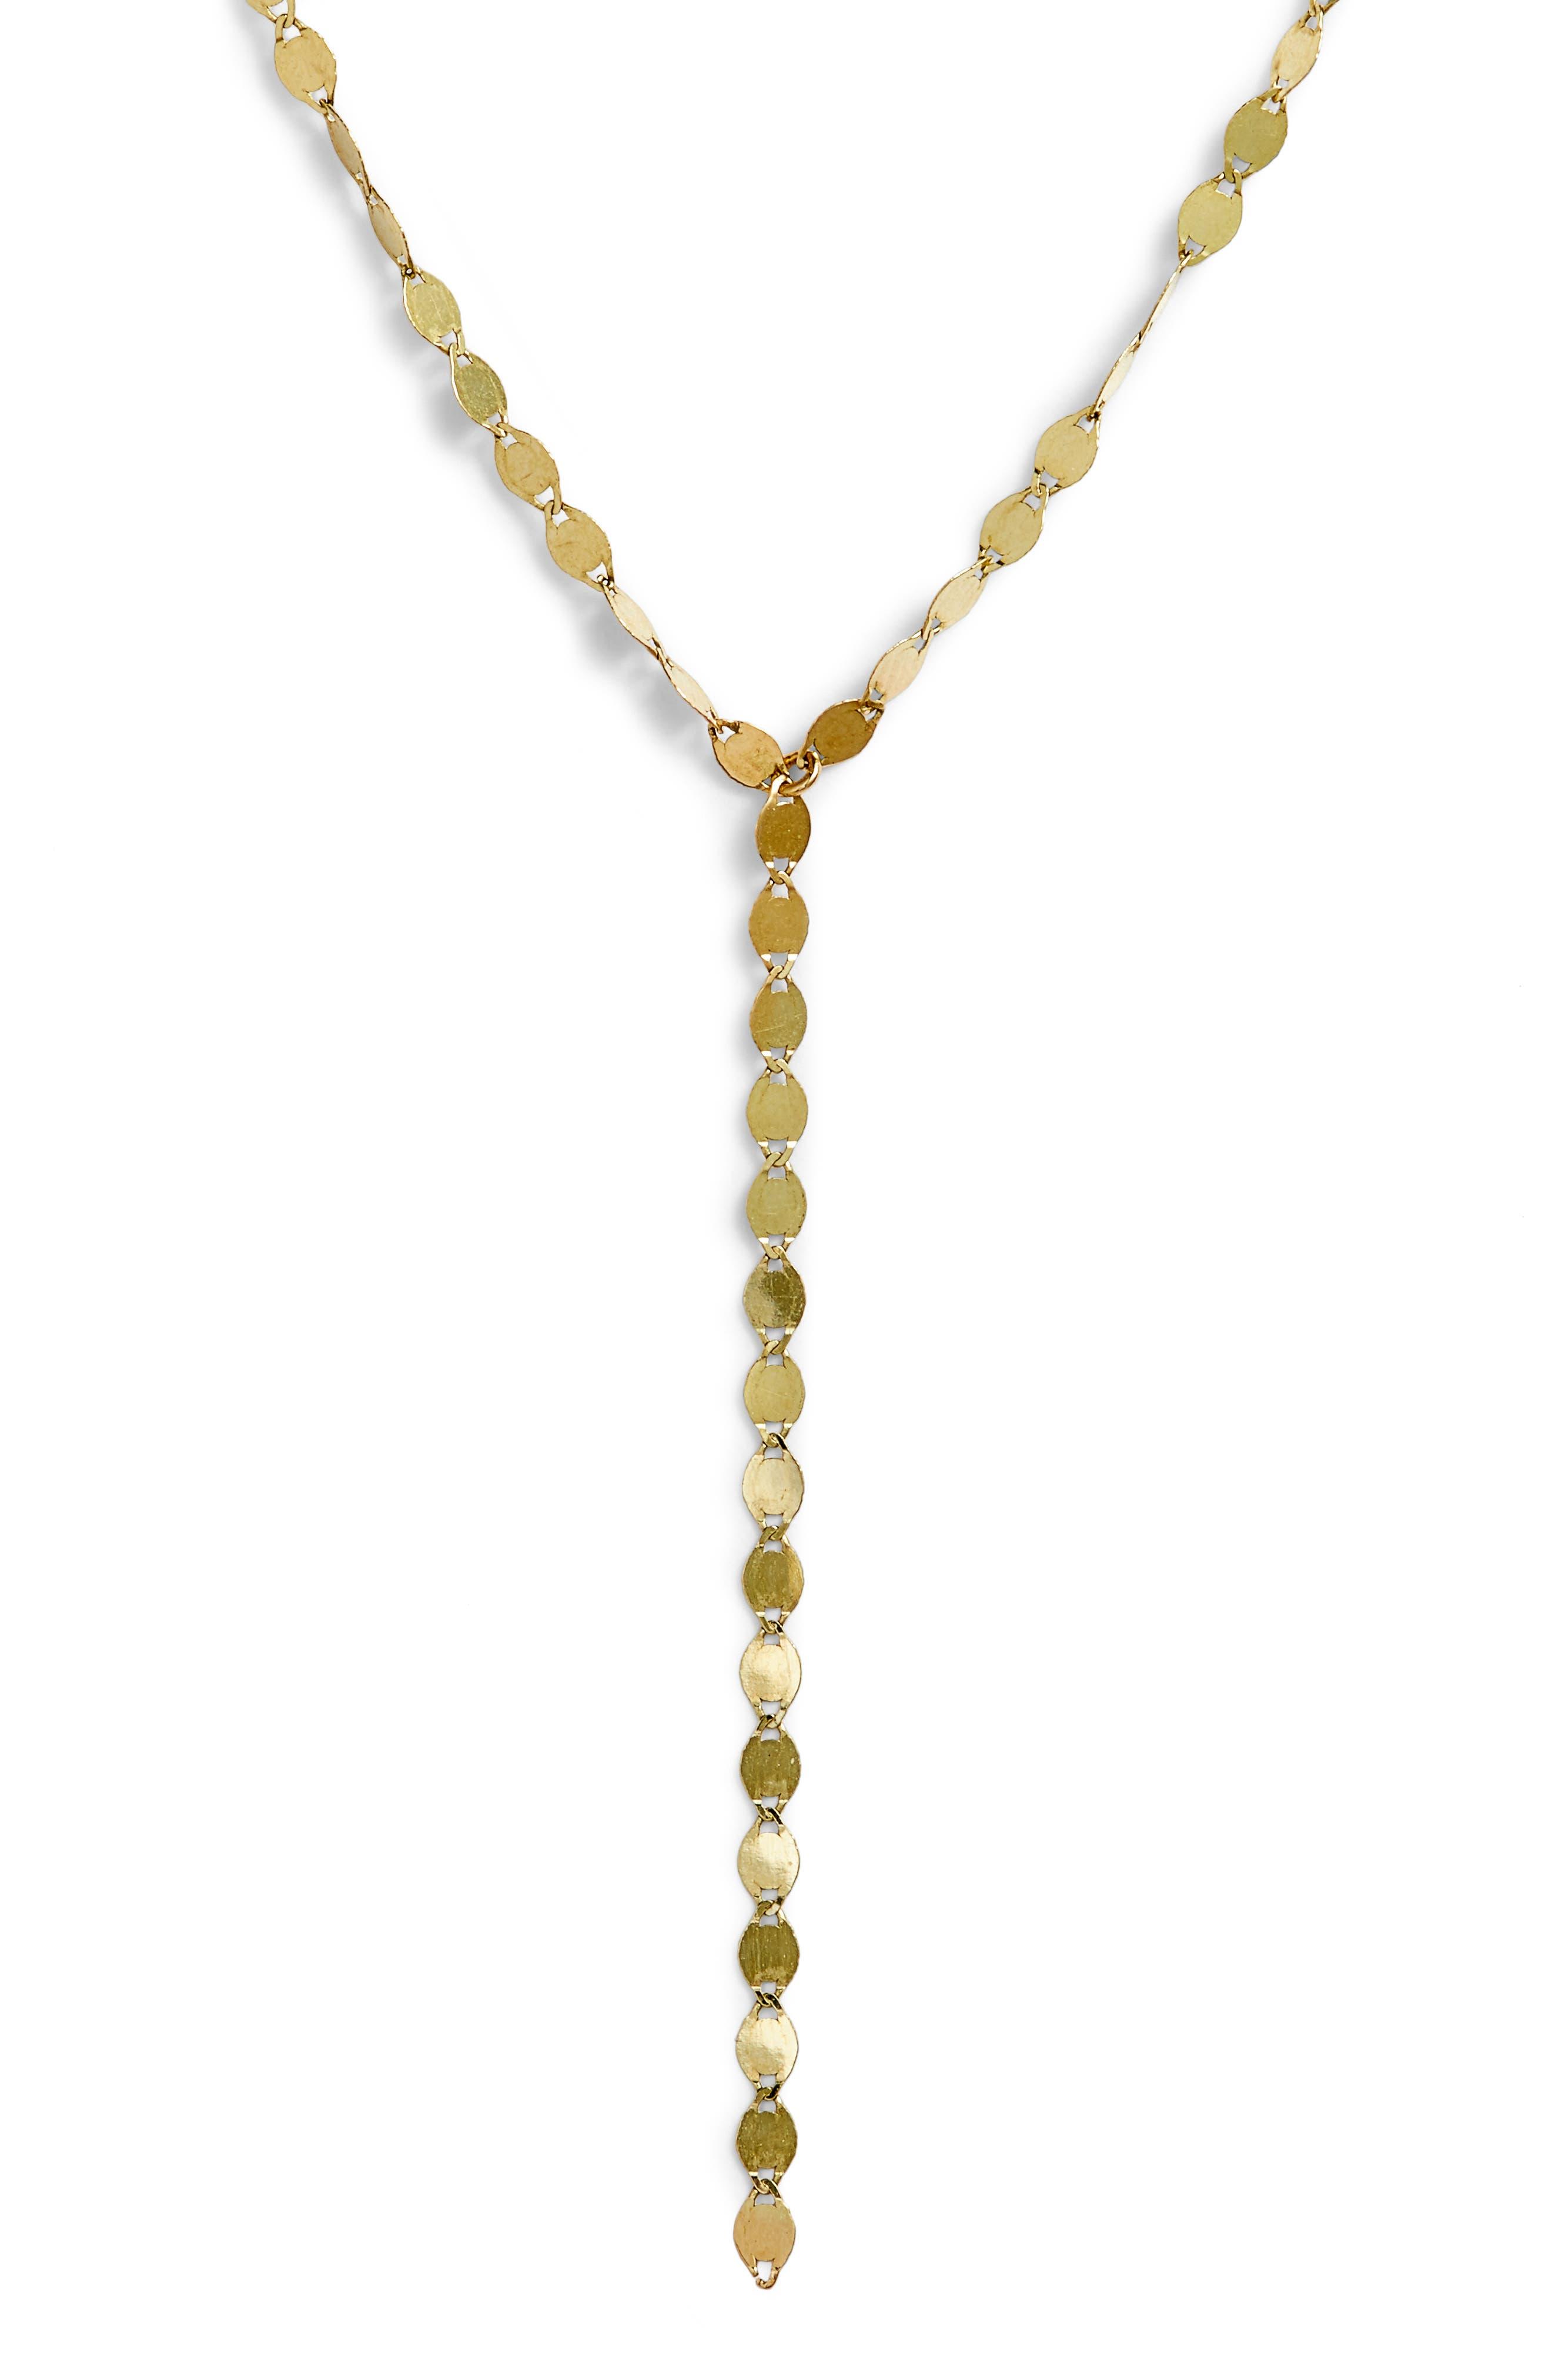 Main Image - Lana Girl by Lana Jewelry Mini Chain Lariat Necklace (Girls)